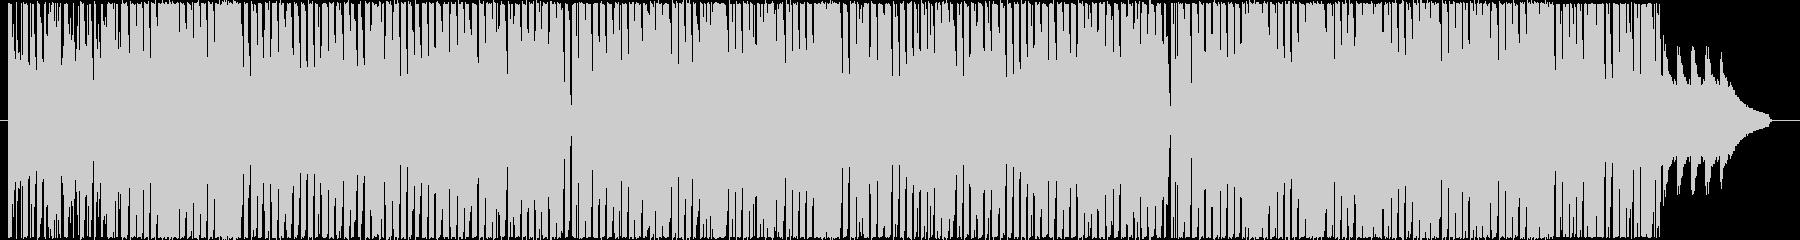 TikTokピコピコカワイイテクノの未再生の波形